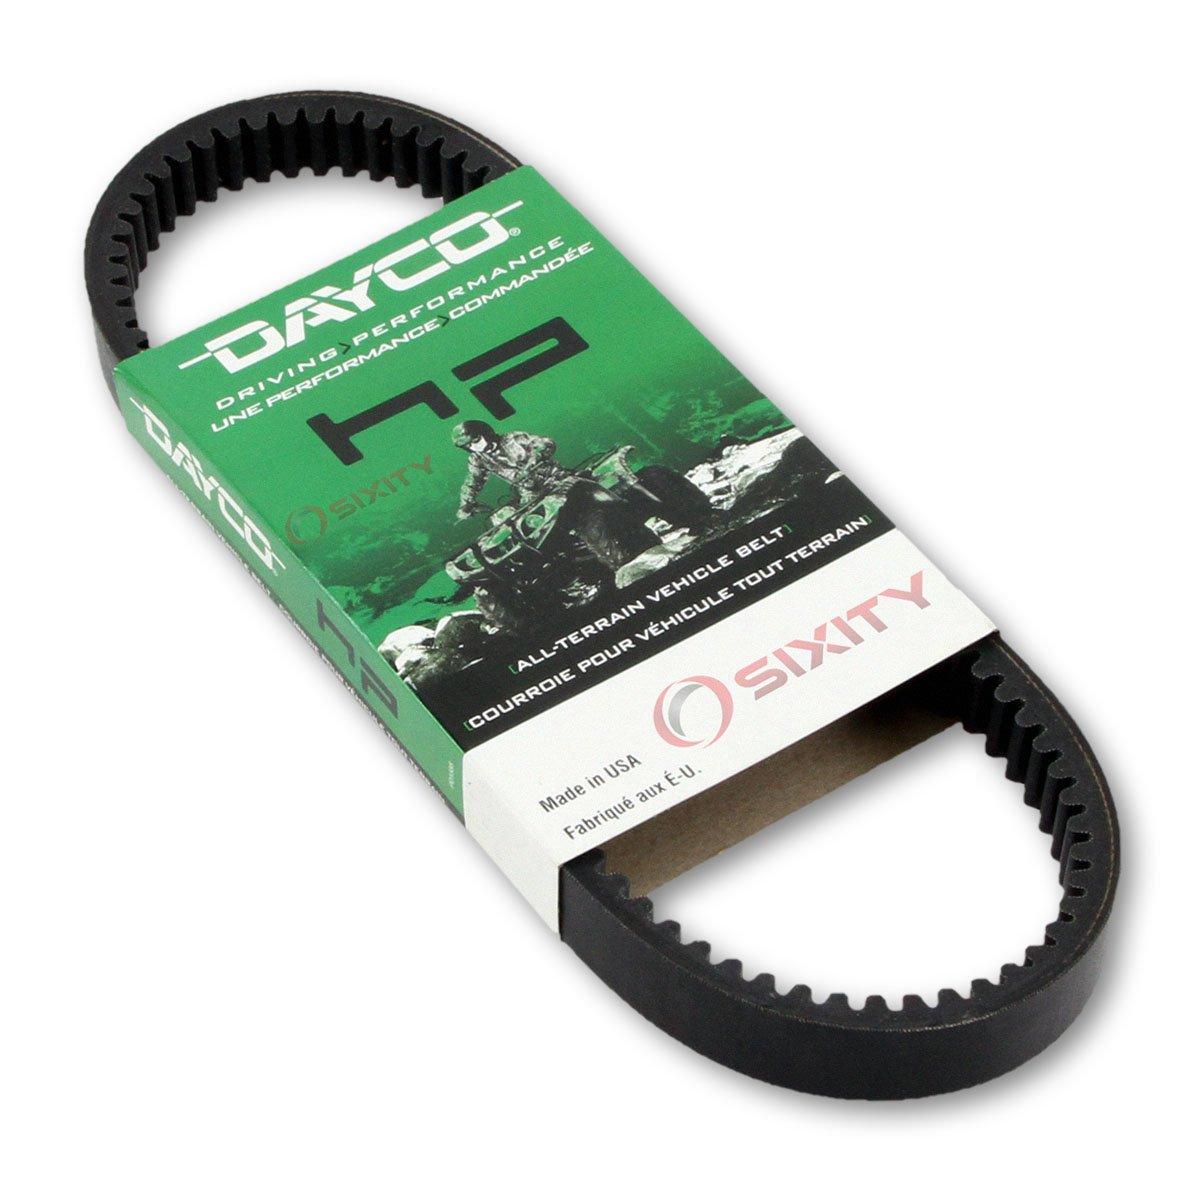 2011-2014 Polaris Sportsman 400 HO Drive Belt Dayco HP ATV OEM Upgrade Replacement Transmission Belts